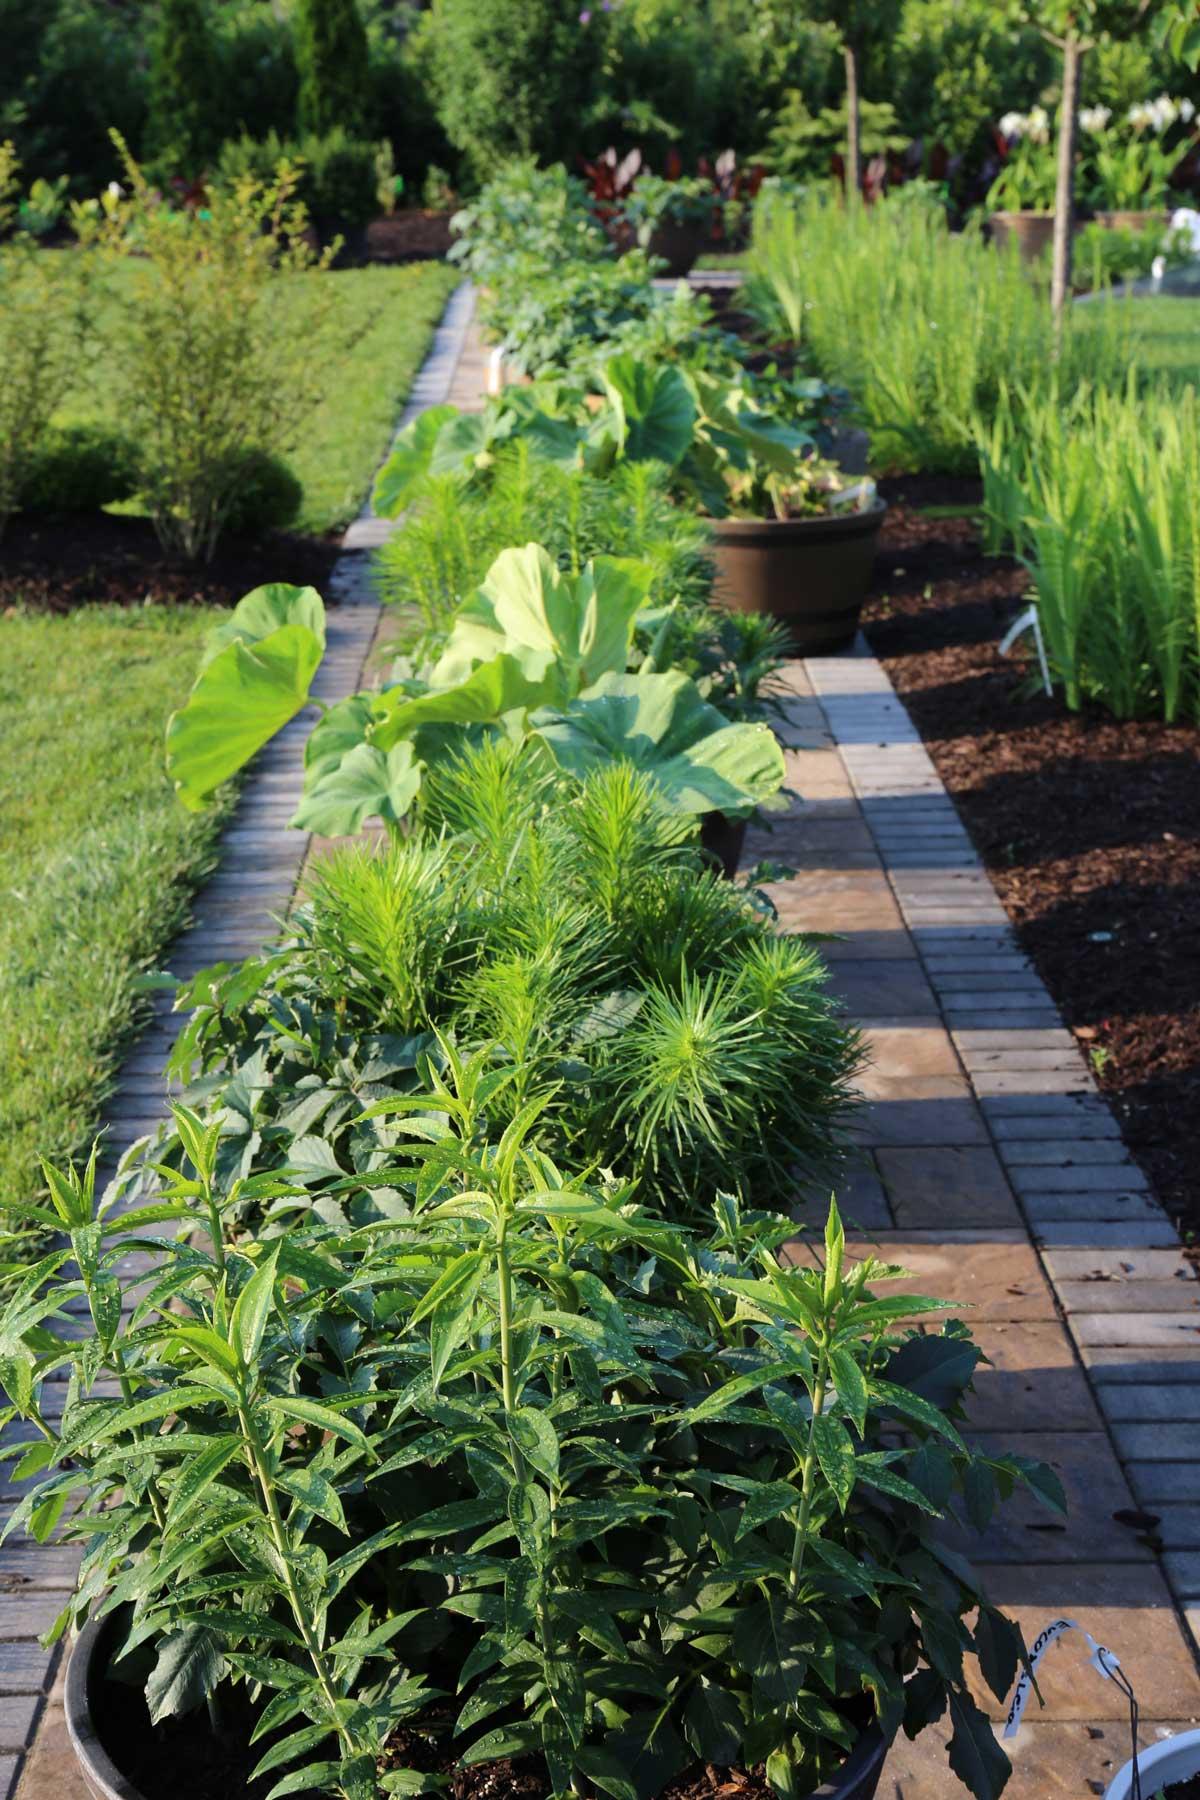 Trial-Garden-Update Liatris and Elephant Ears - Longfield-Gardens